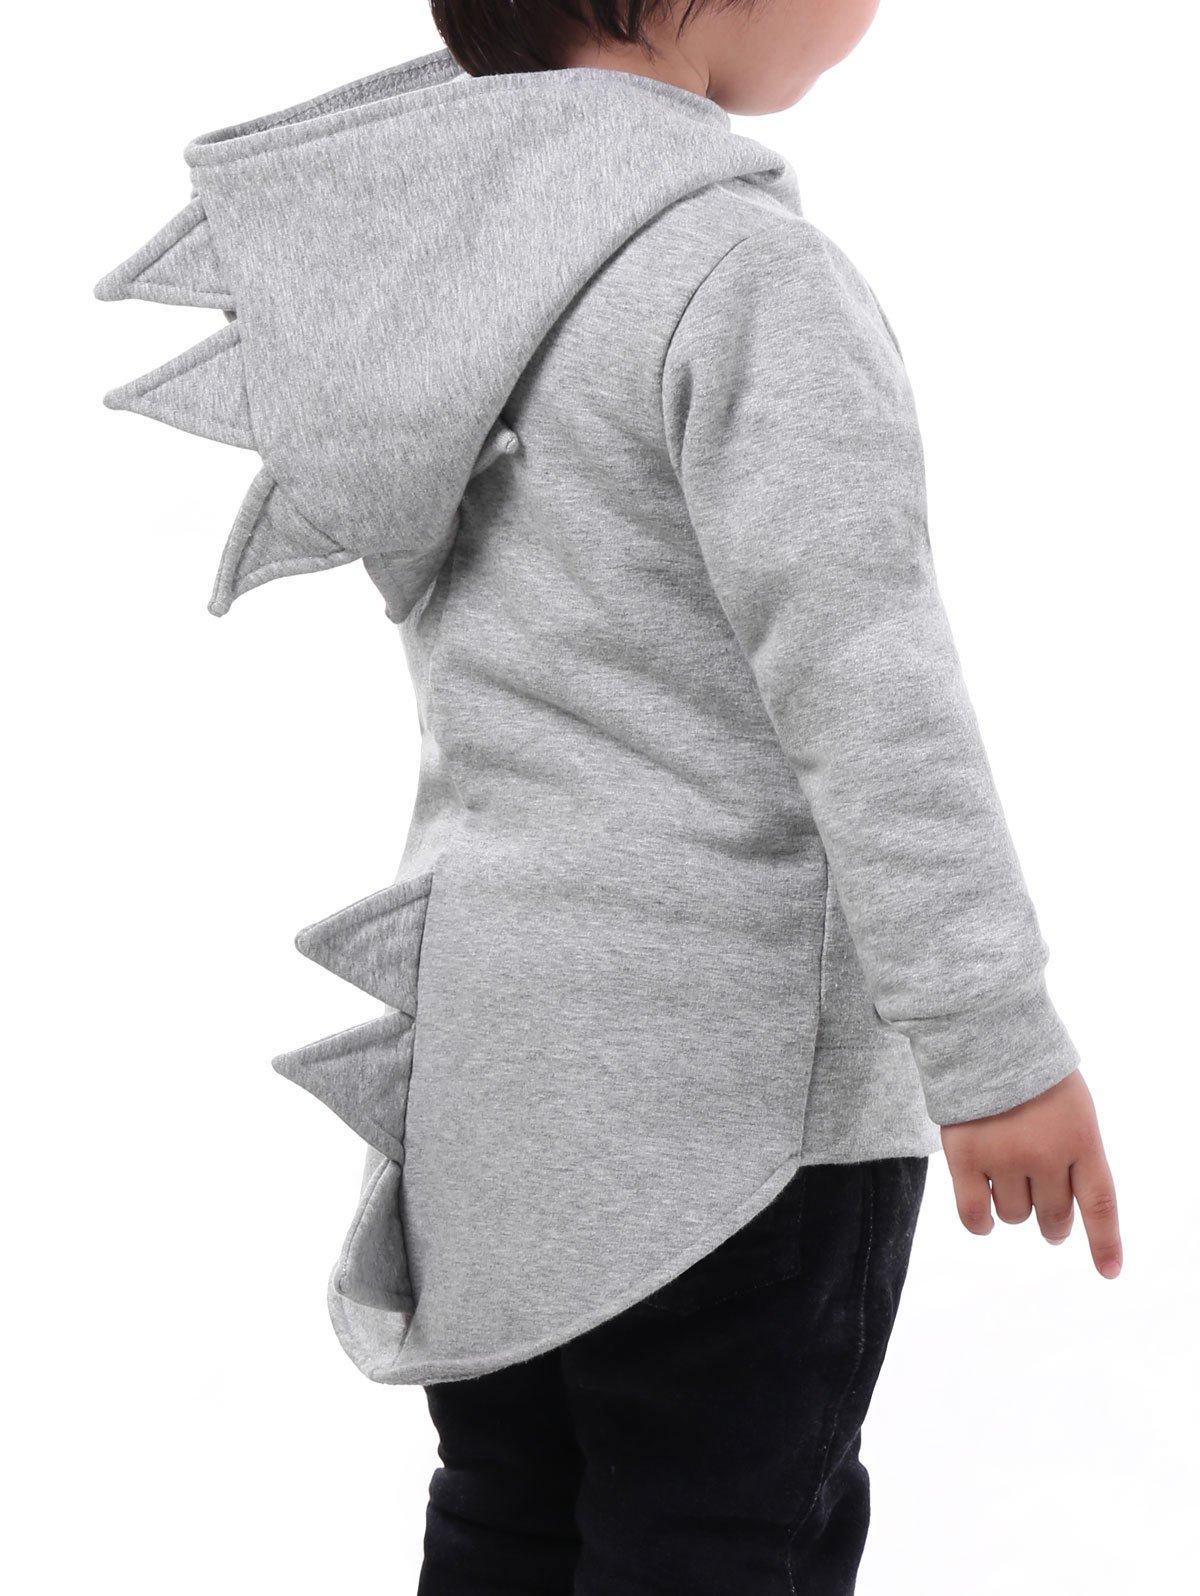 Baby Boy Animal Dinosaur Fleece Zip Front Hoodie High-Low Hem Kids Sweatshirt (Grey, 110 (4T)) by Oeillet d'ne